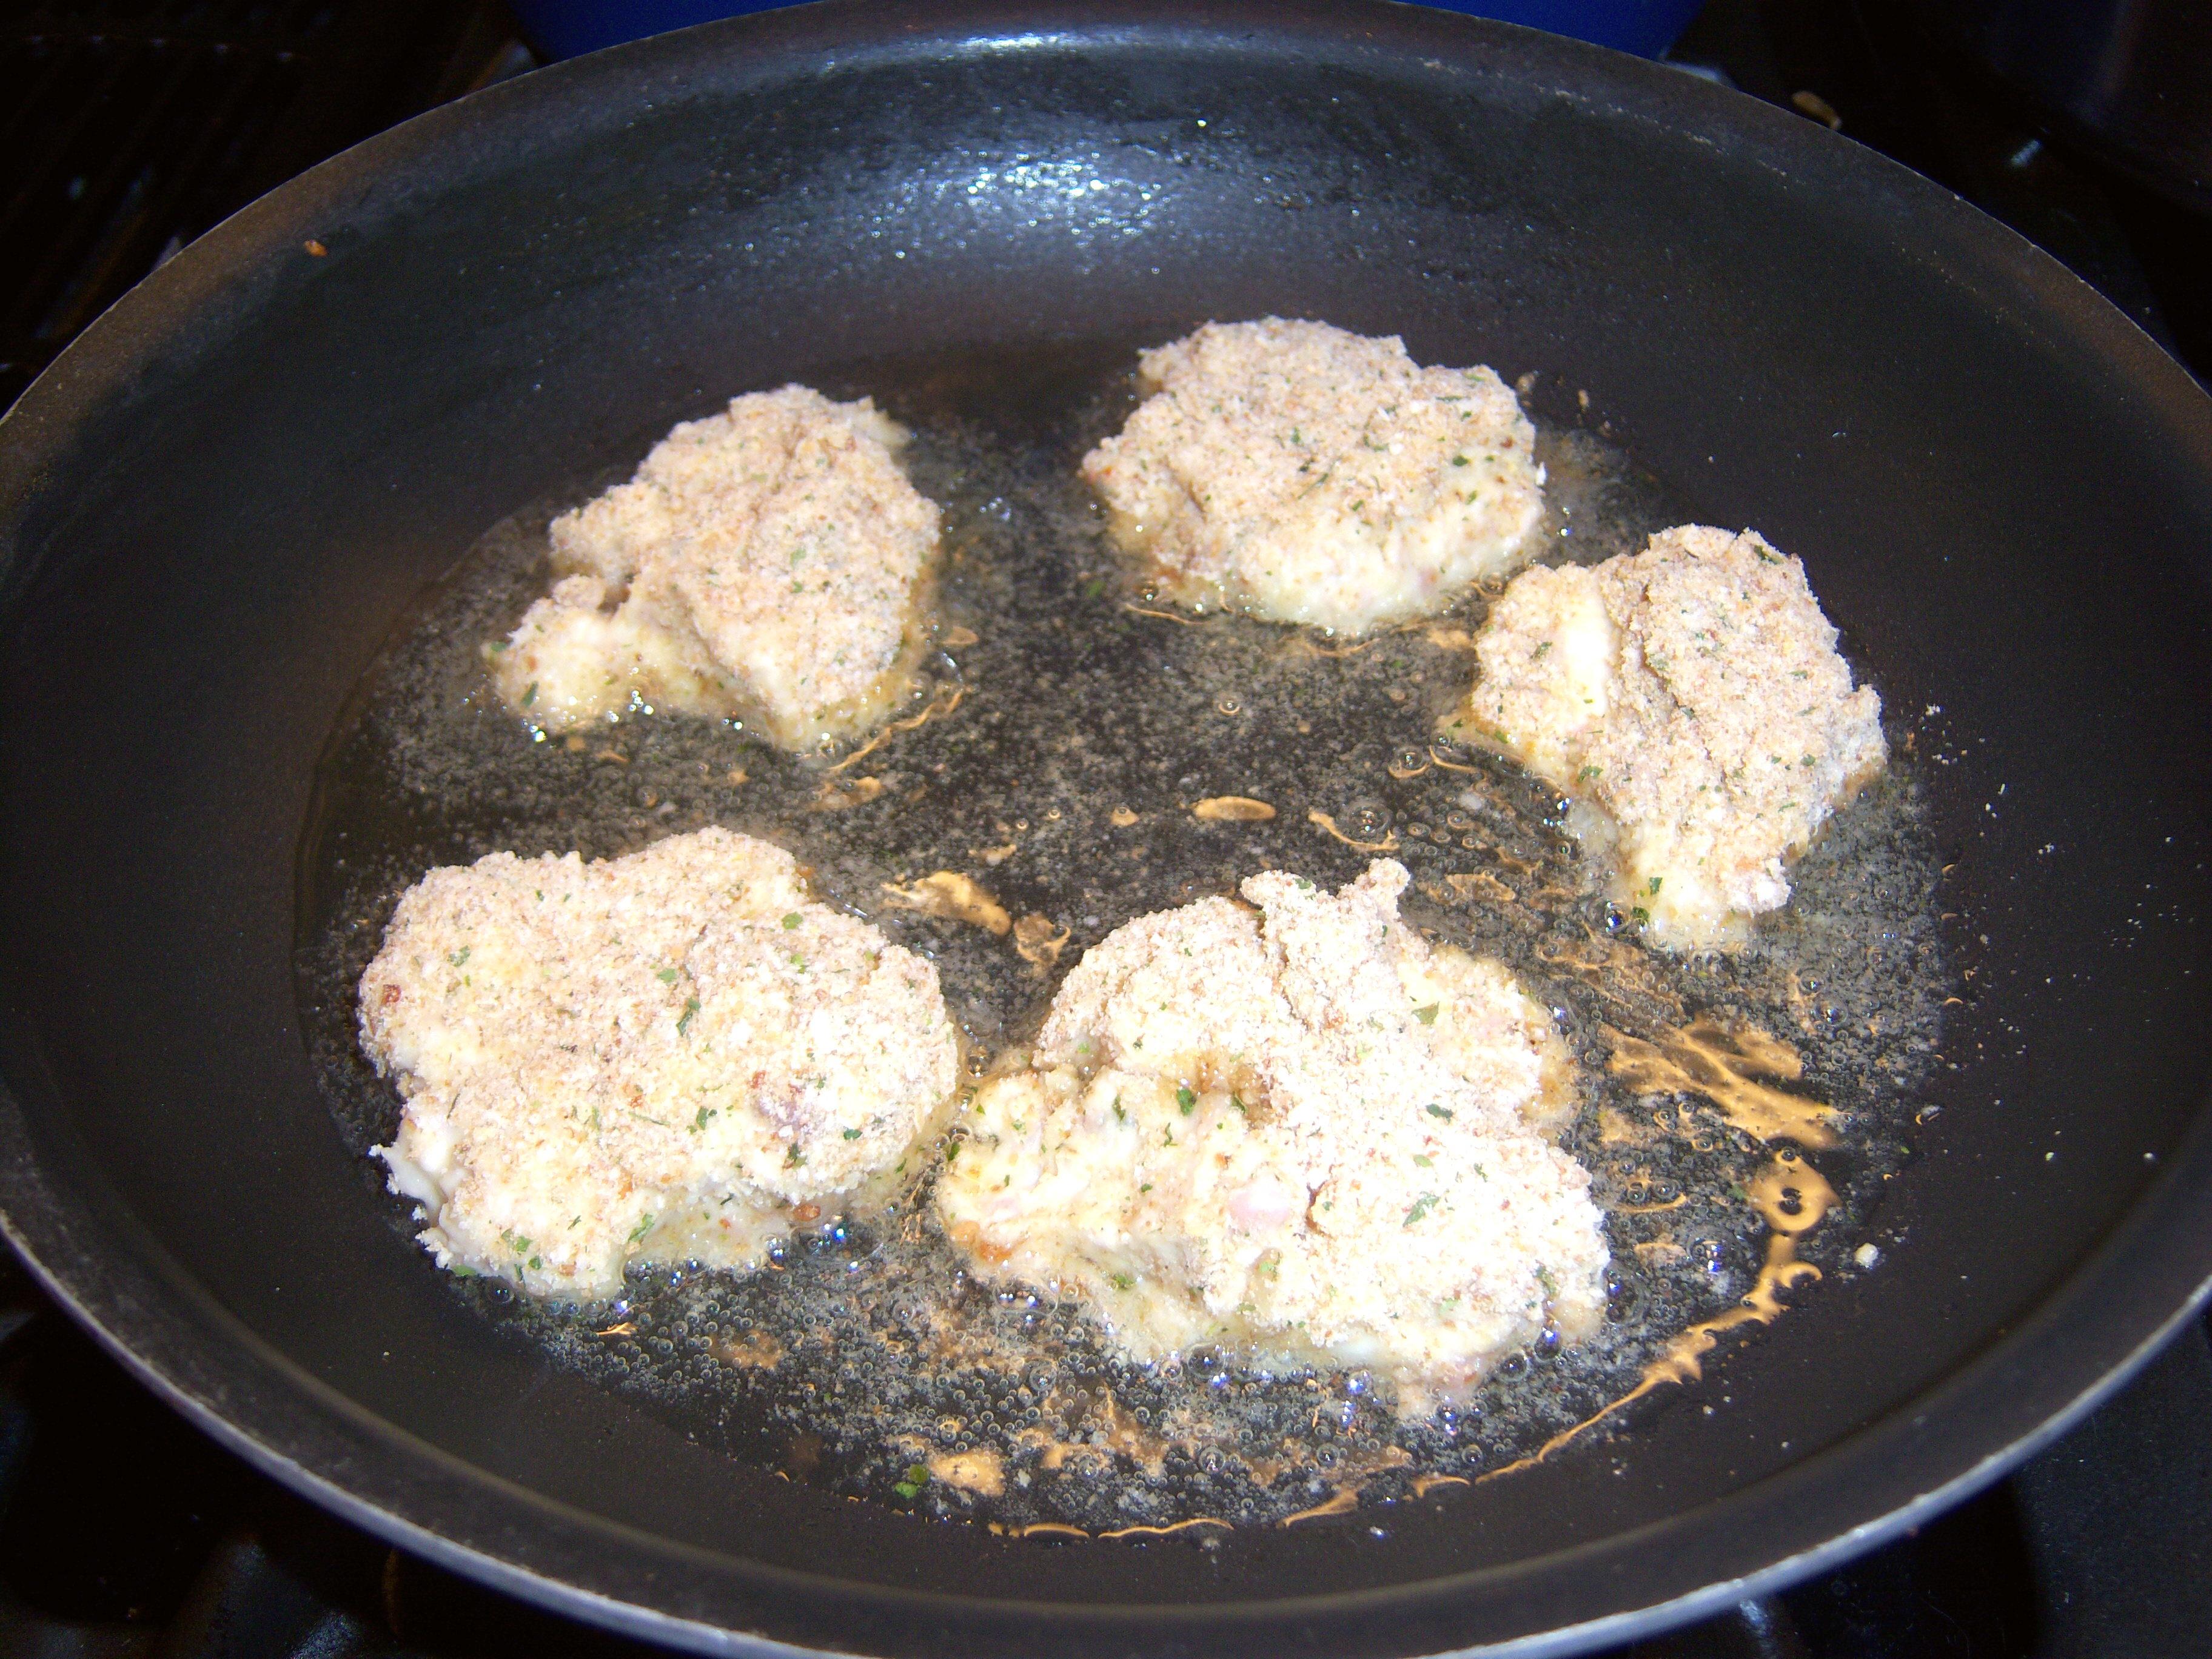 Fry it up in a pan